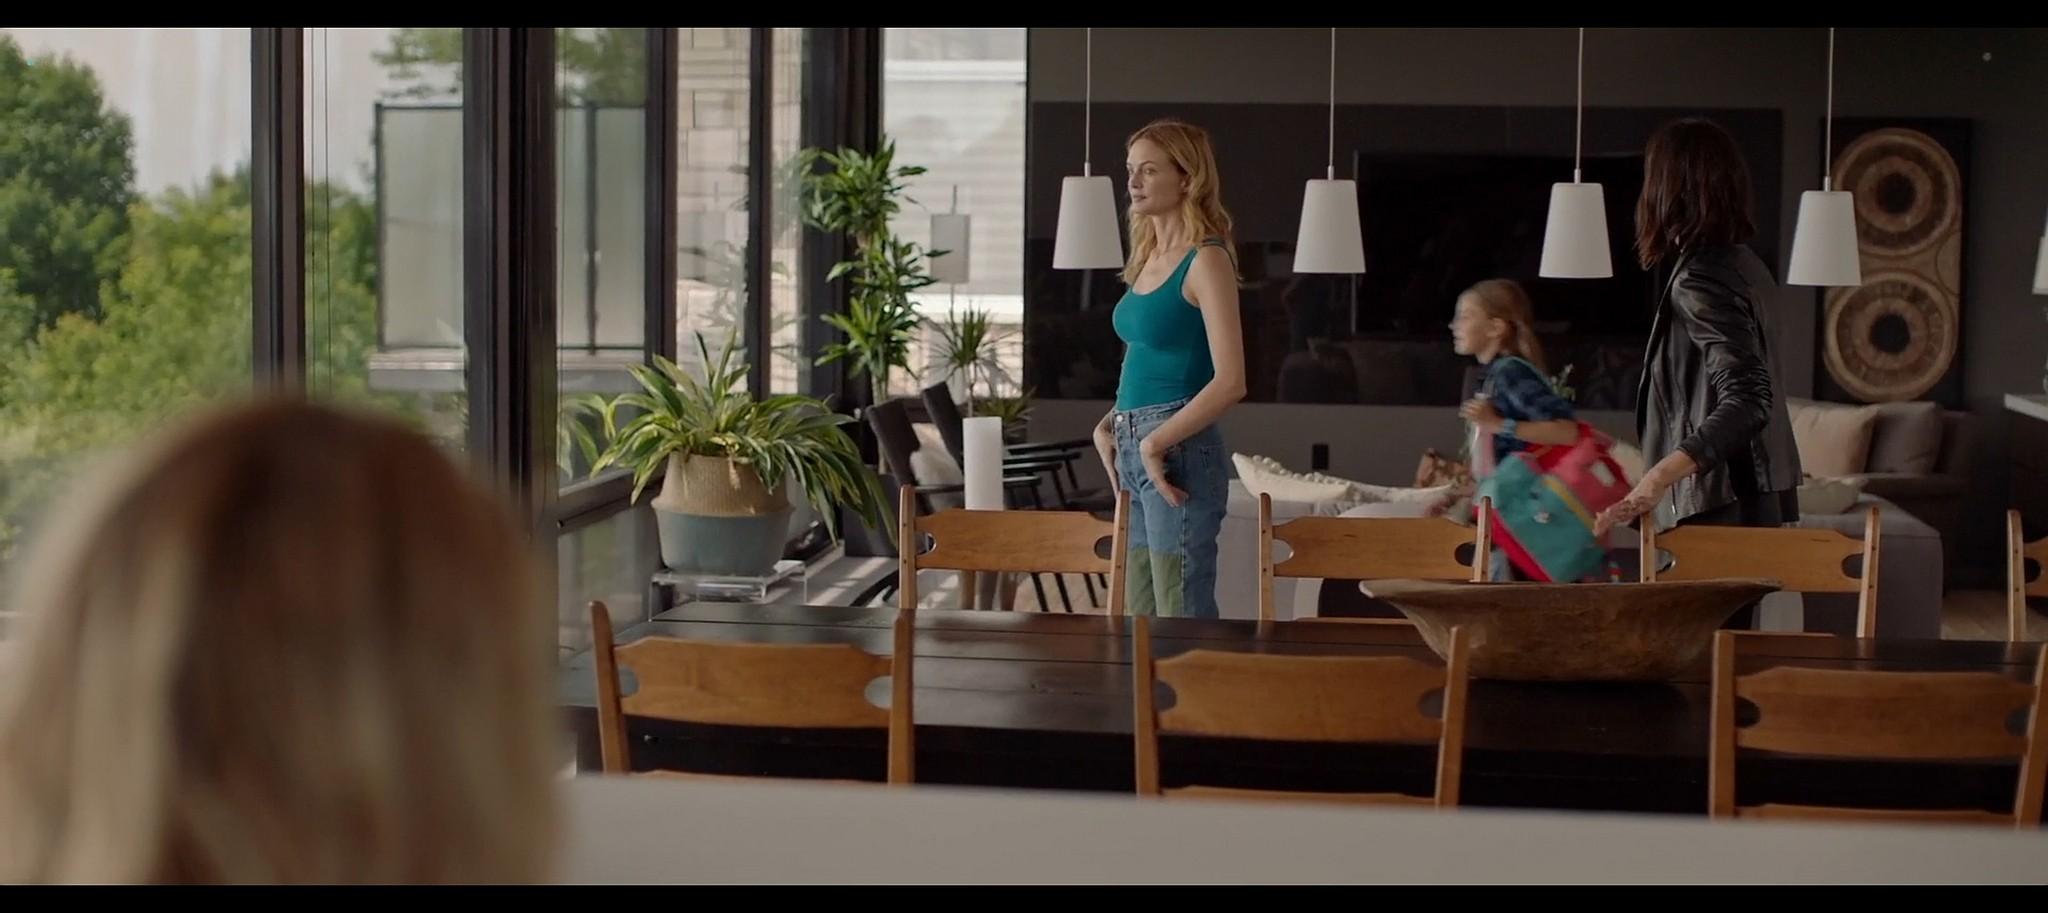 Heather Graham sexy Sophie Nelisse Jodi Balfour hot The Rest of Us 2019 1080p WEB 7